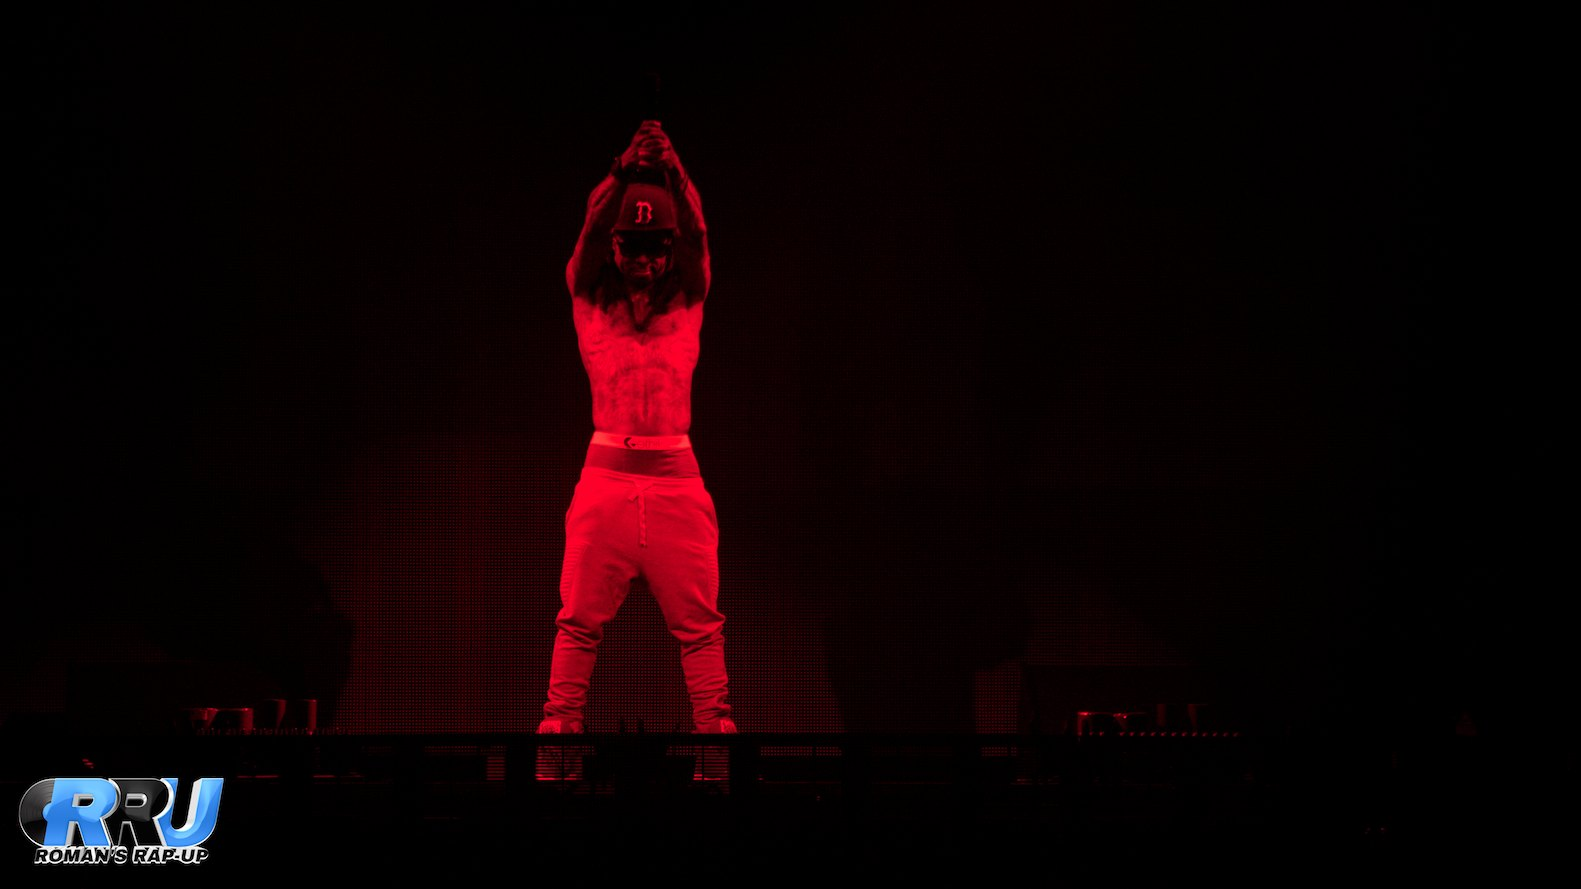 Drake Vs. Lil Wayne 24.jpg